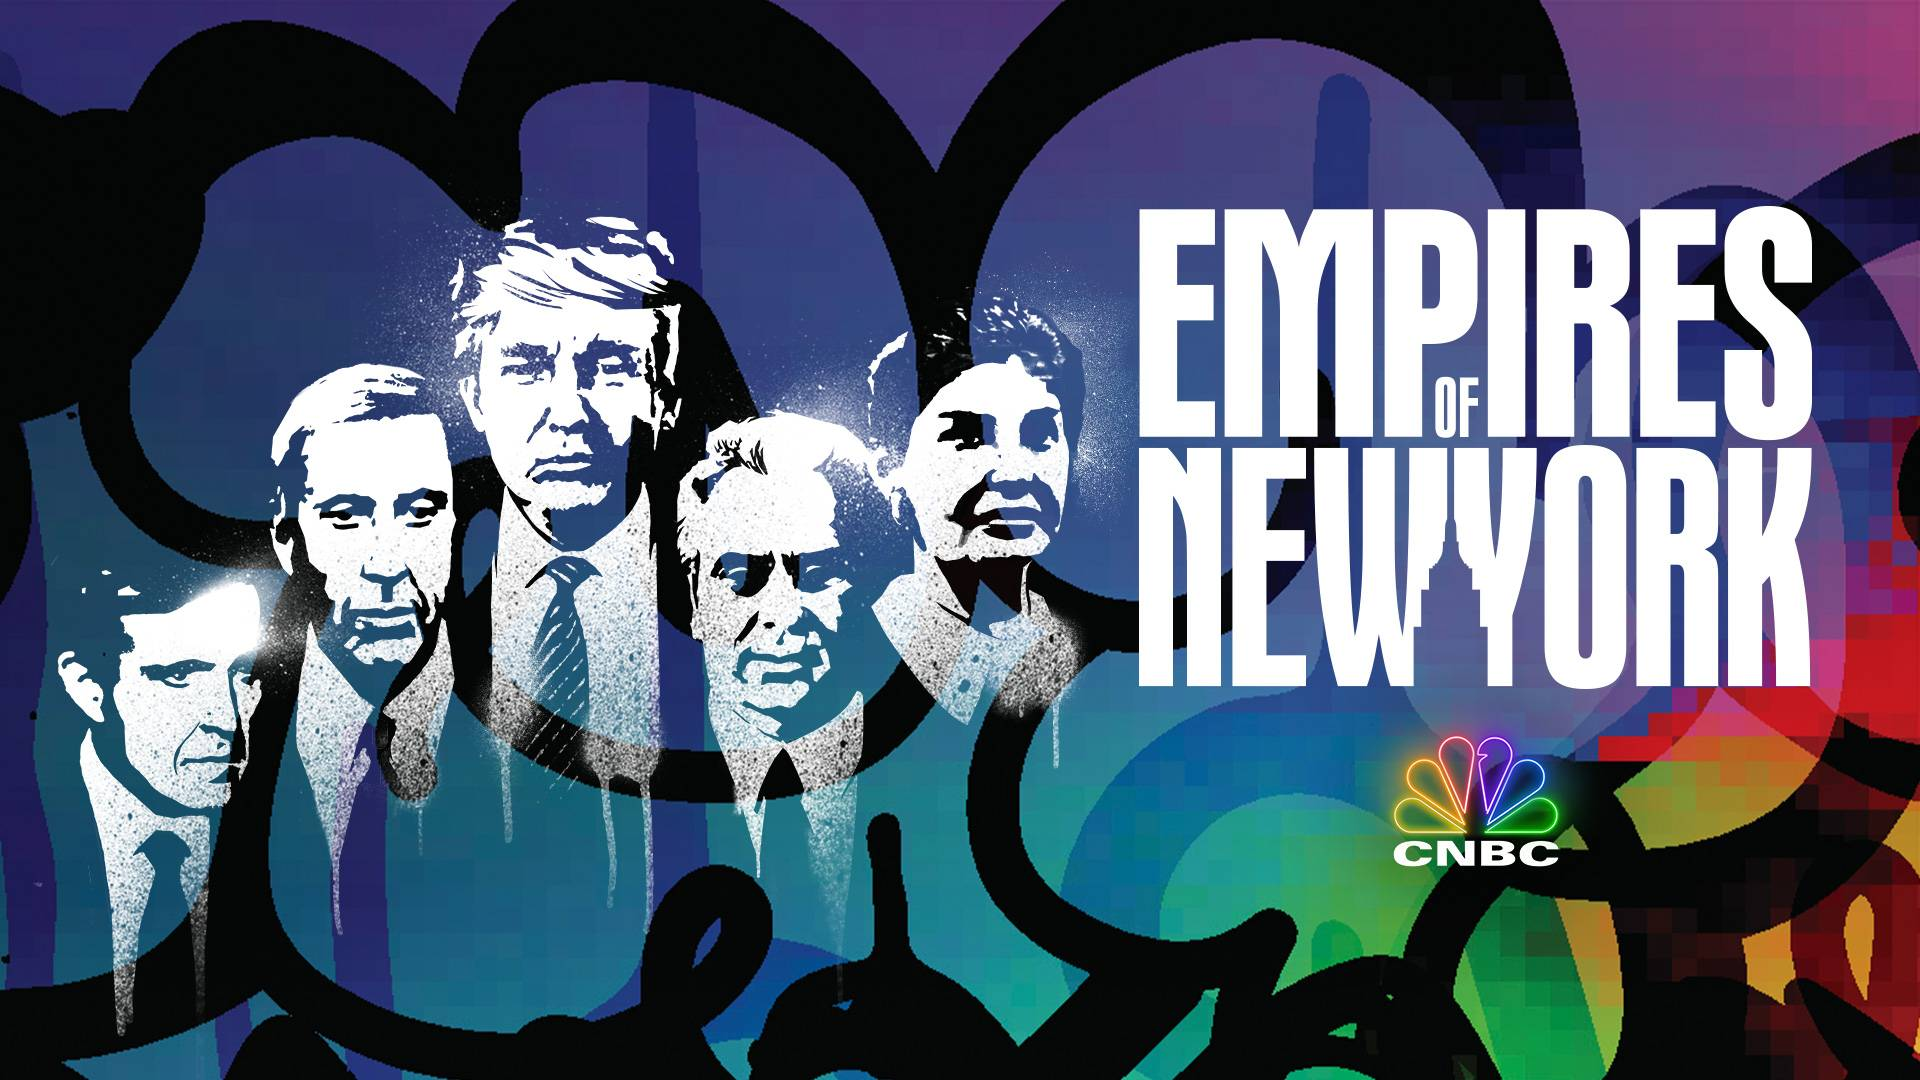 Carstva New Yorka